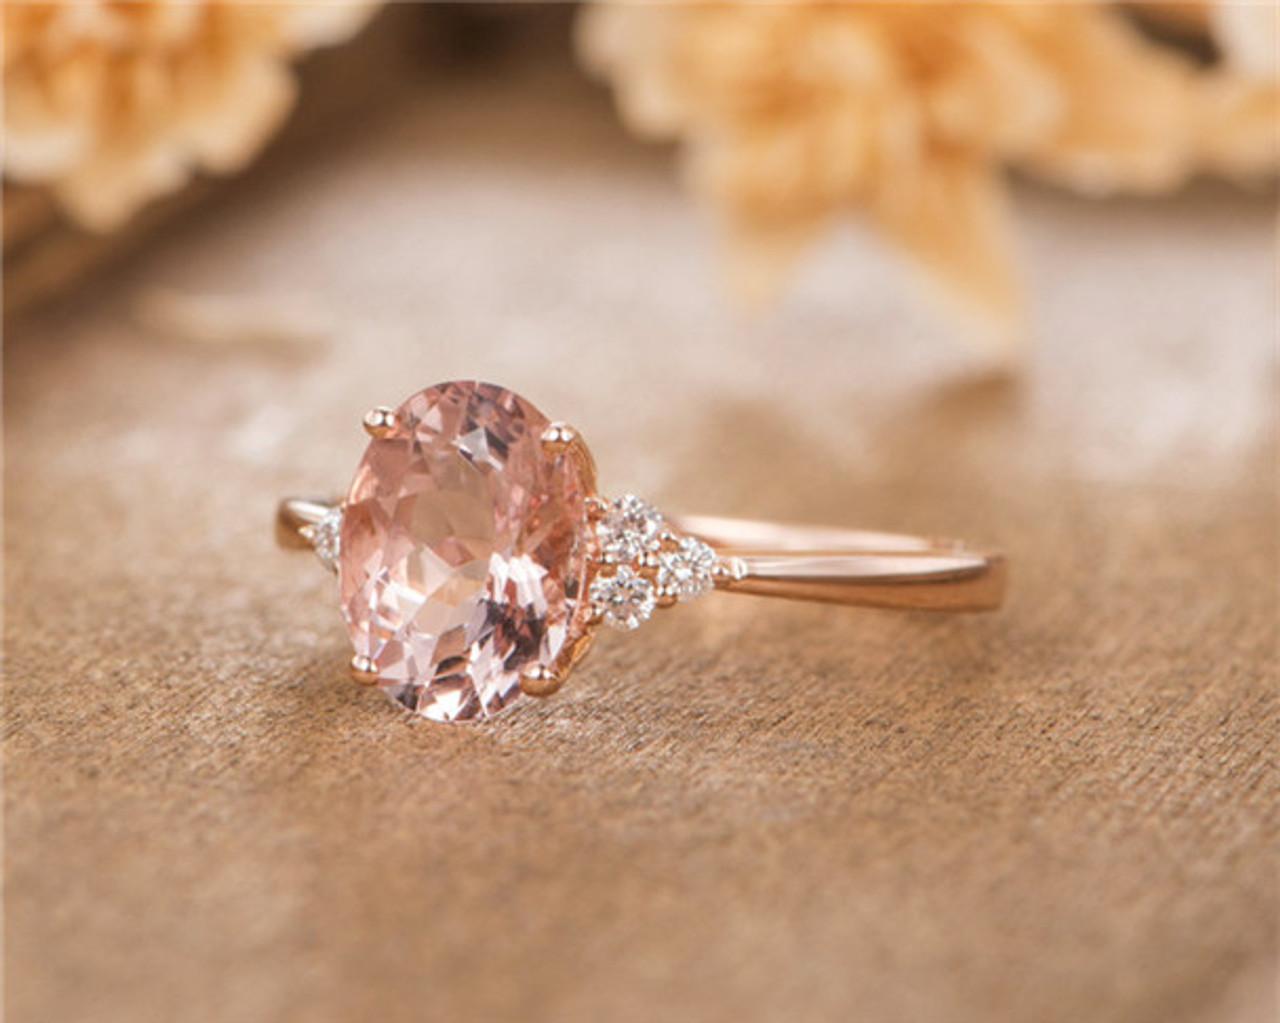 Rose Gold Bridal Ring Oval Cut Morganite Engagement Ring Simple Women Anniversary Wedding